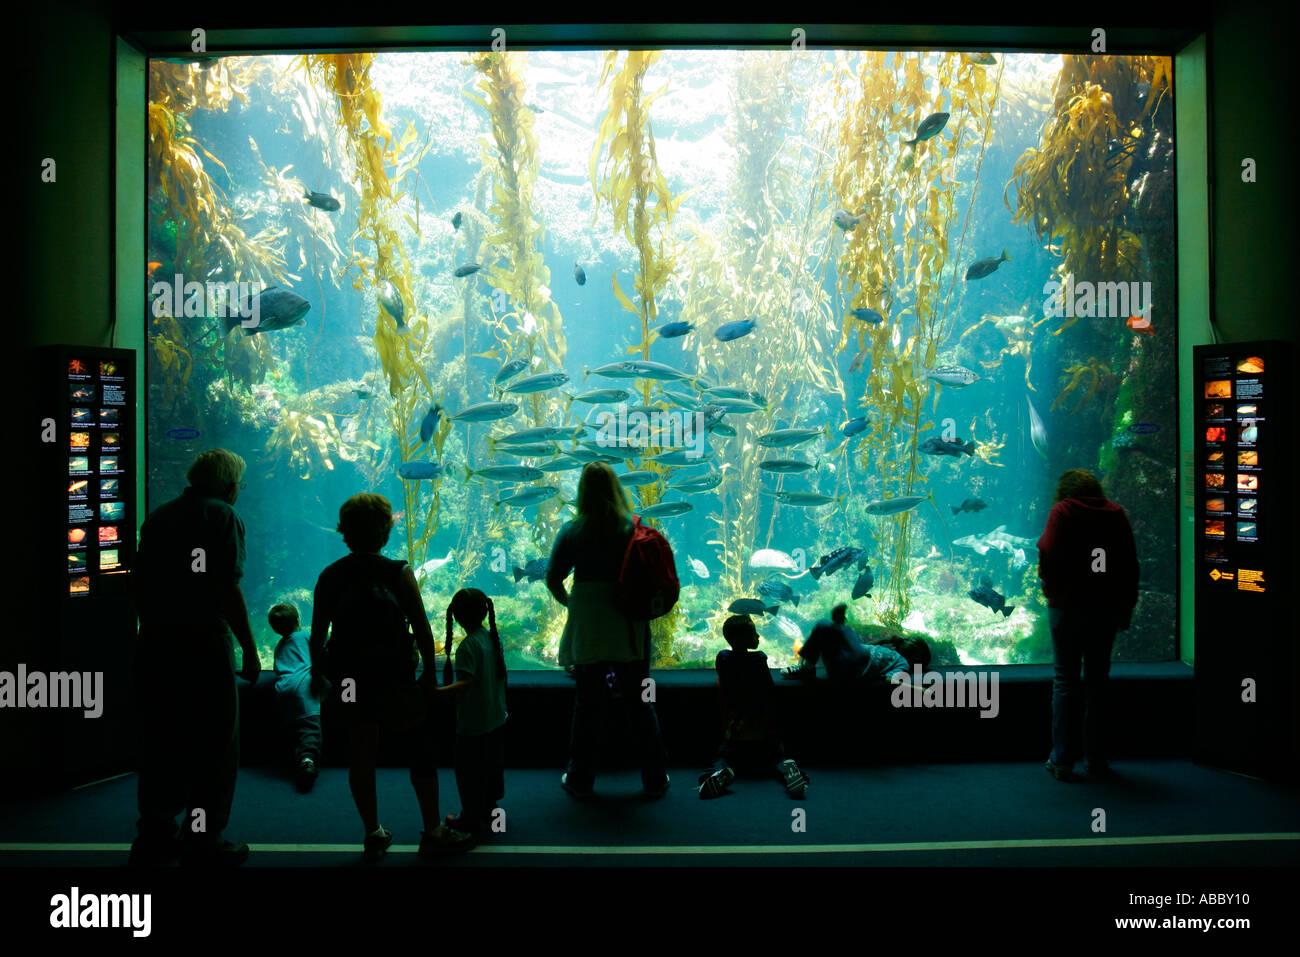 Birch Aquarium At Scripps La Jolla California SD  - Stock Image